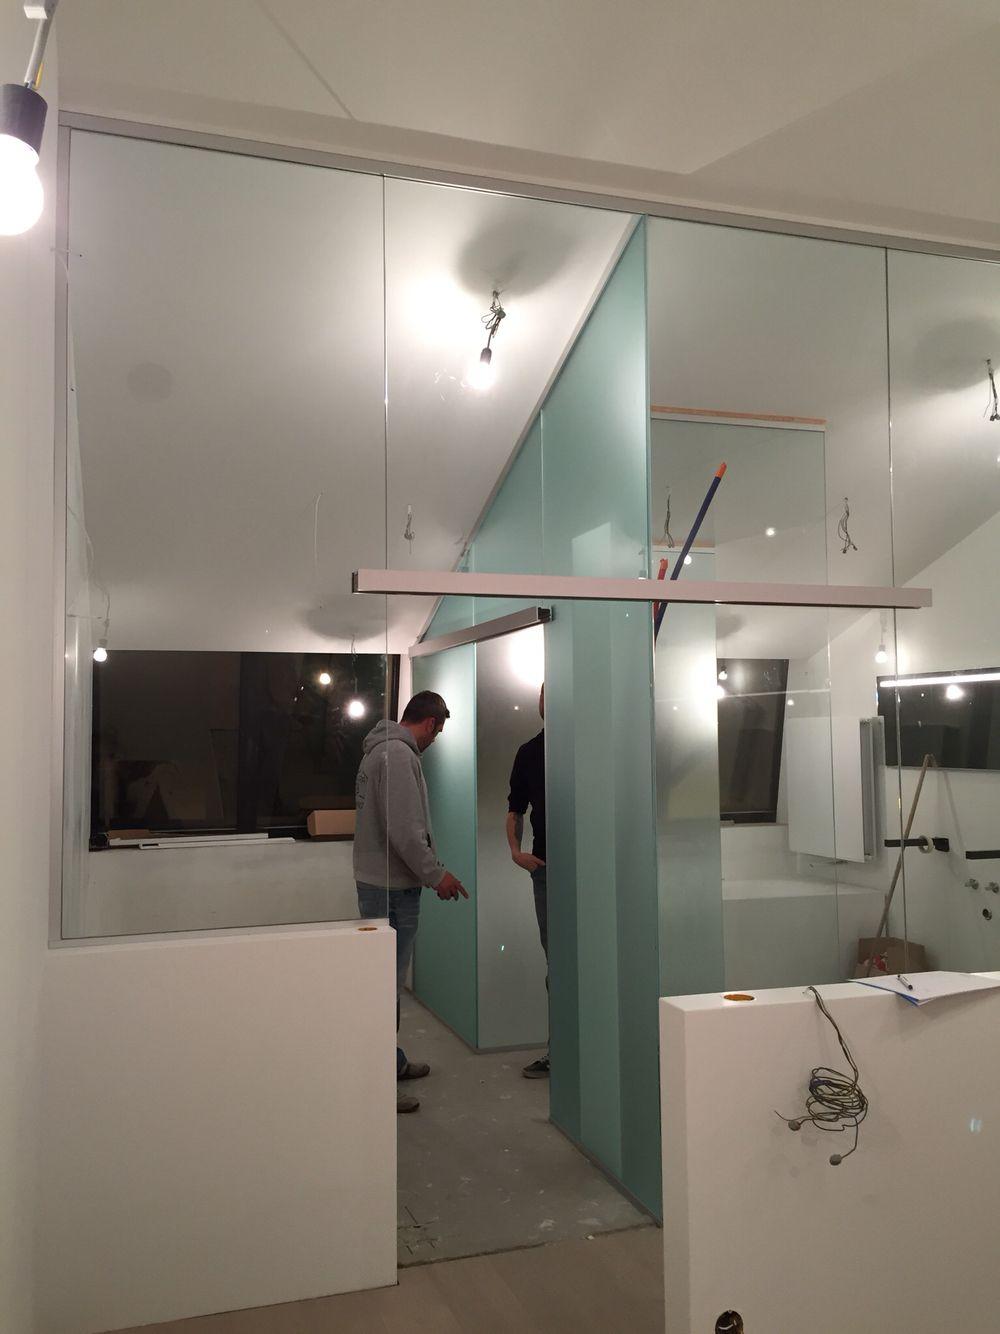 Glazen scheidingswand badkamer | slaapkamer | trap | Interieurglas ...